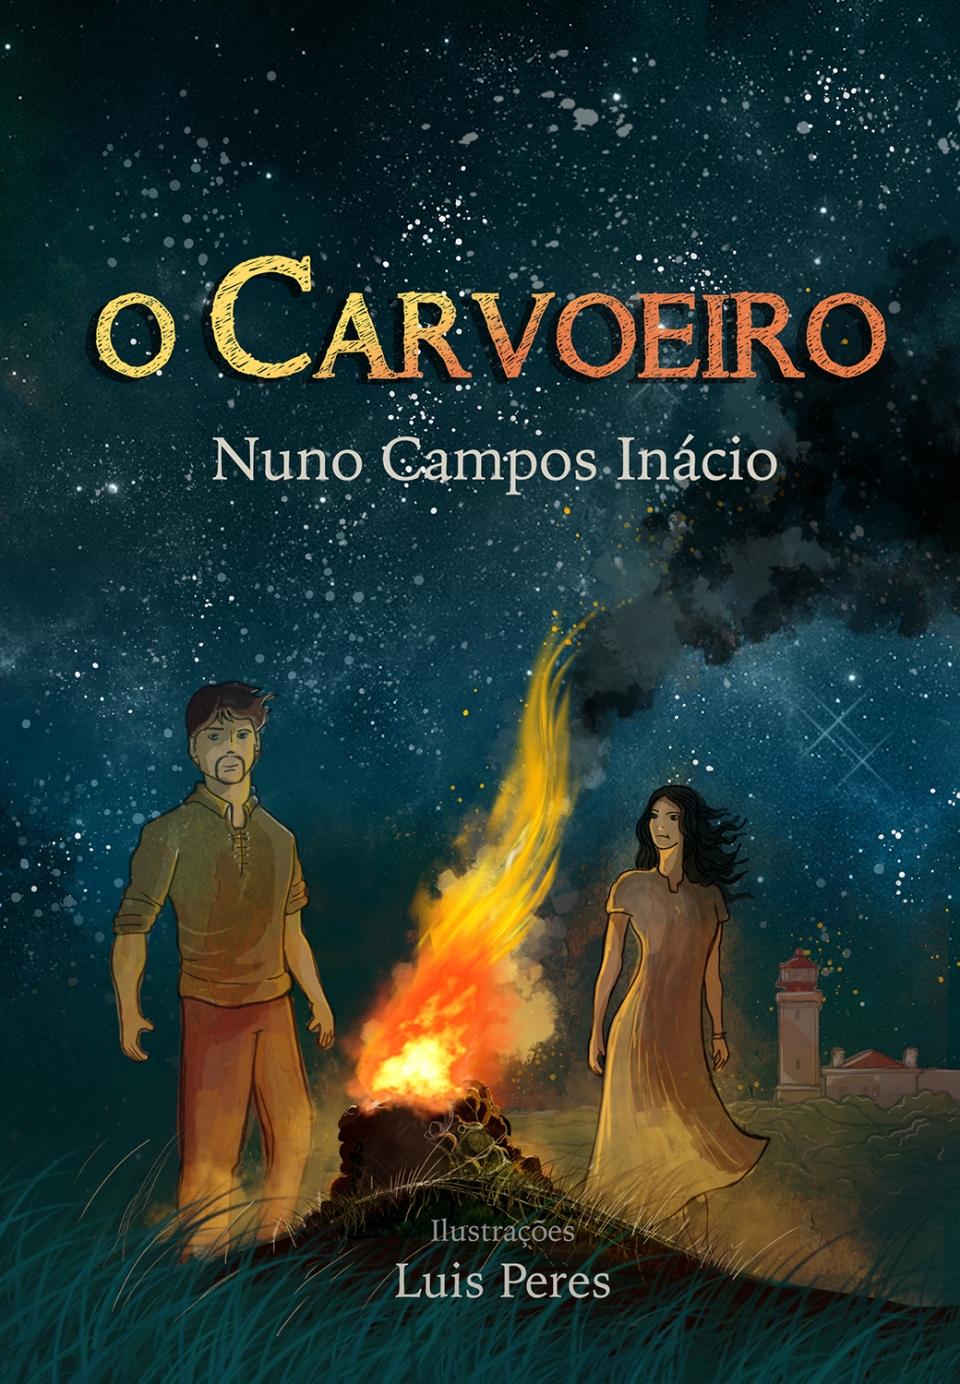 PIC 00 - CAPA DA FRENTE